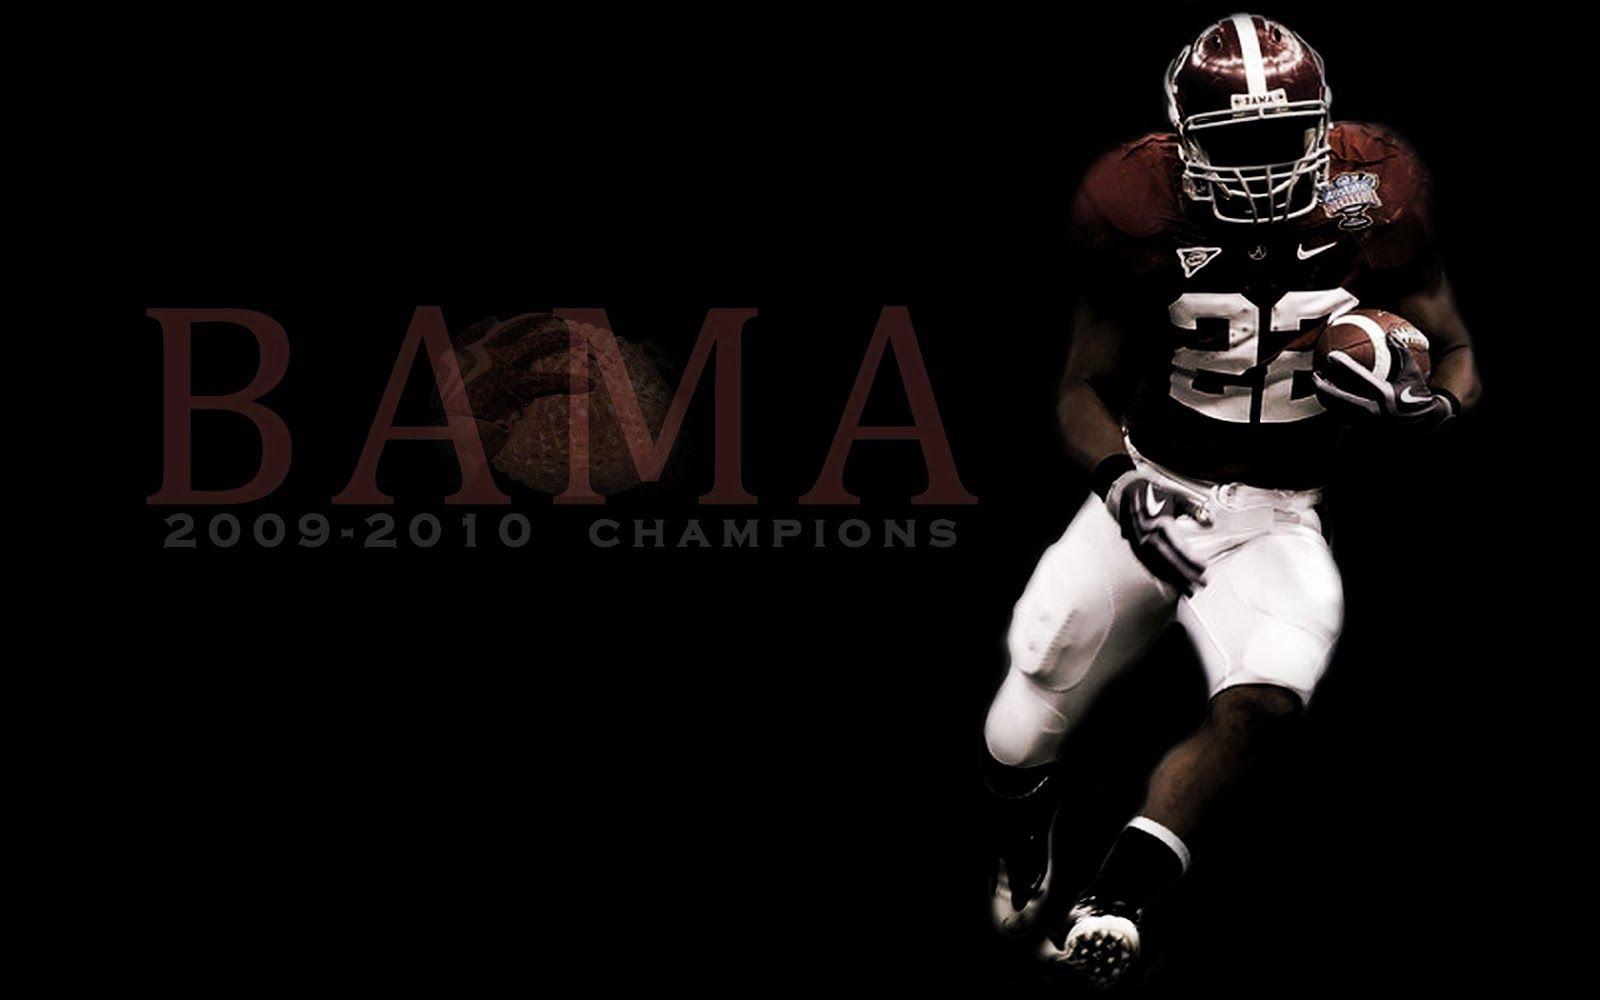 Alabama Football Wallpaper Alabama Football Team